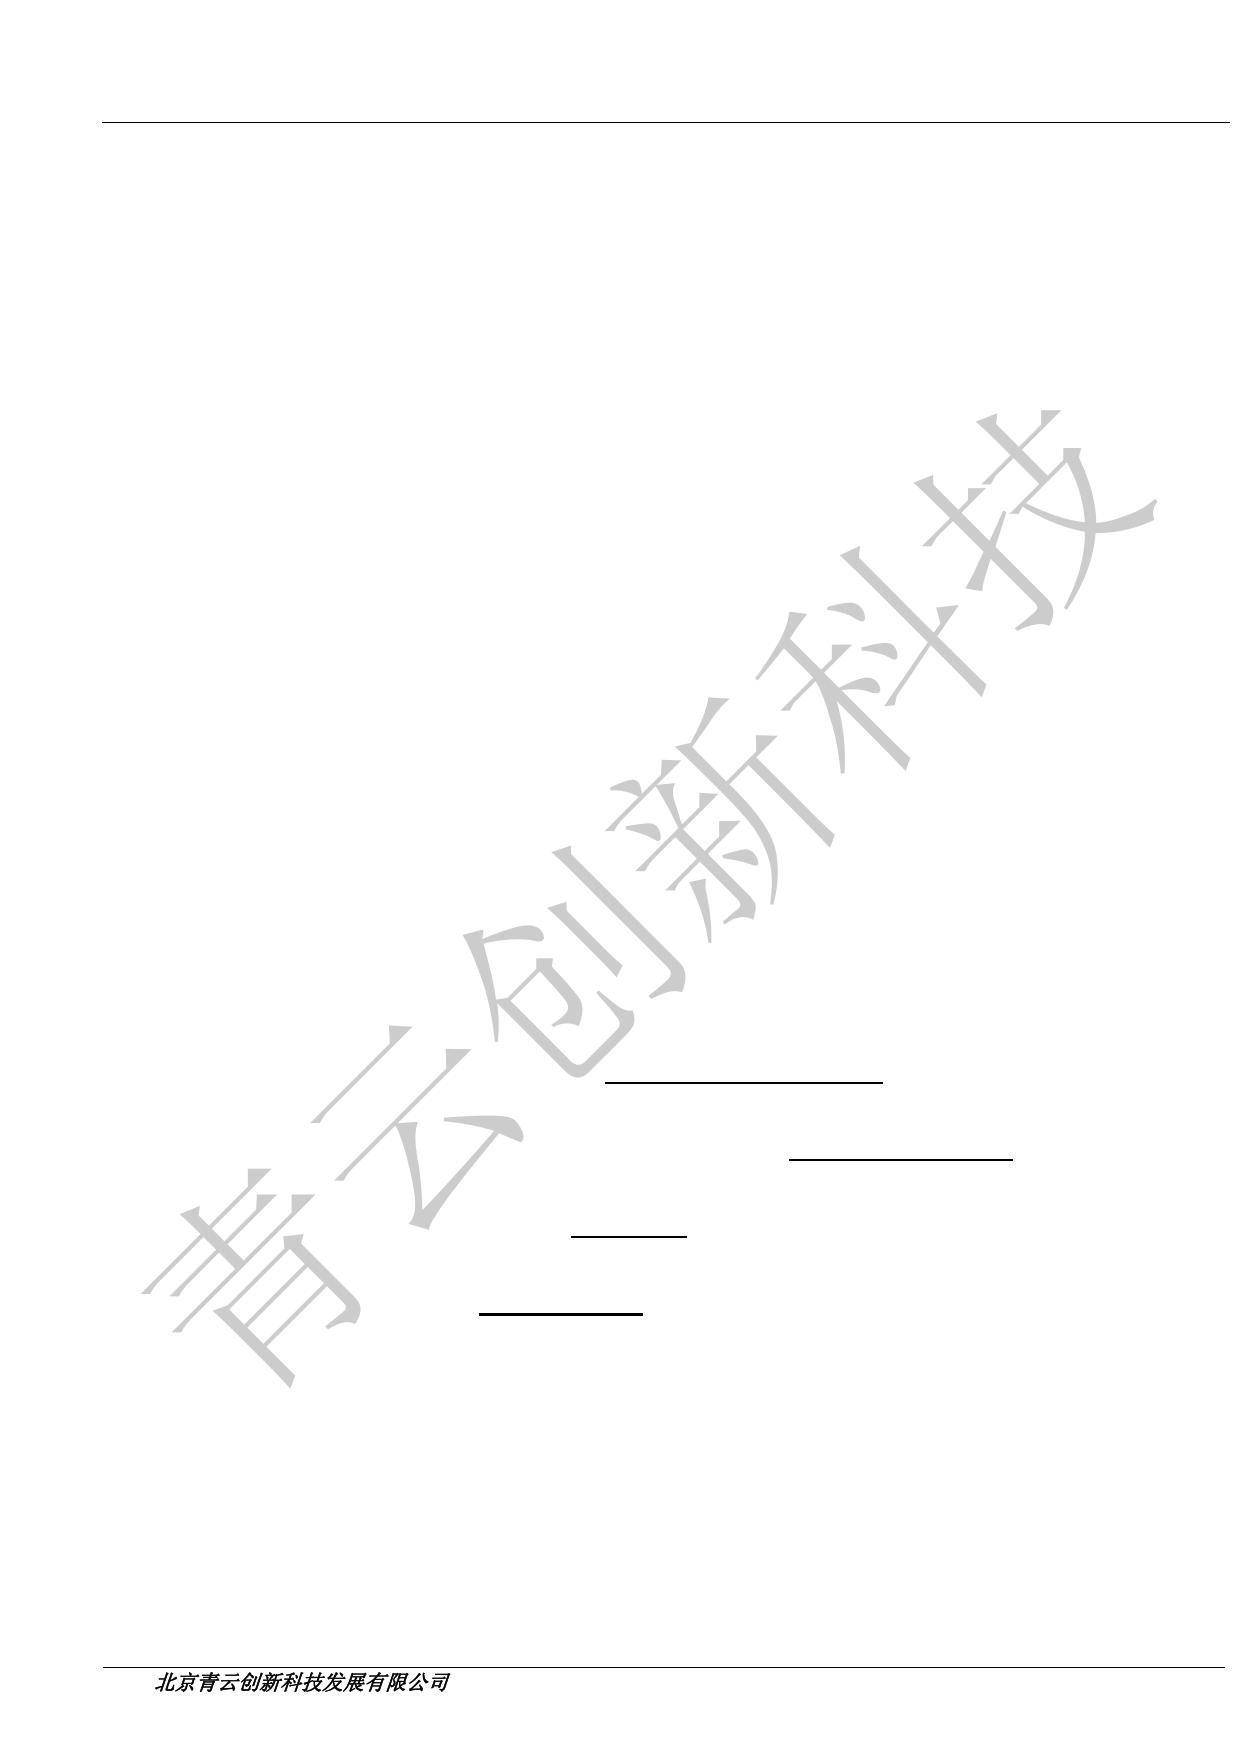 lcm1602a datasheet pdf   pinout